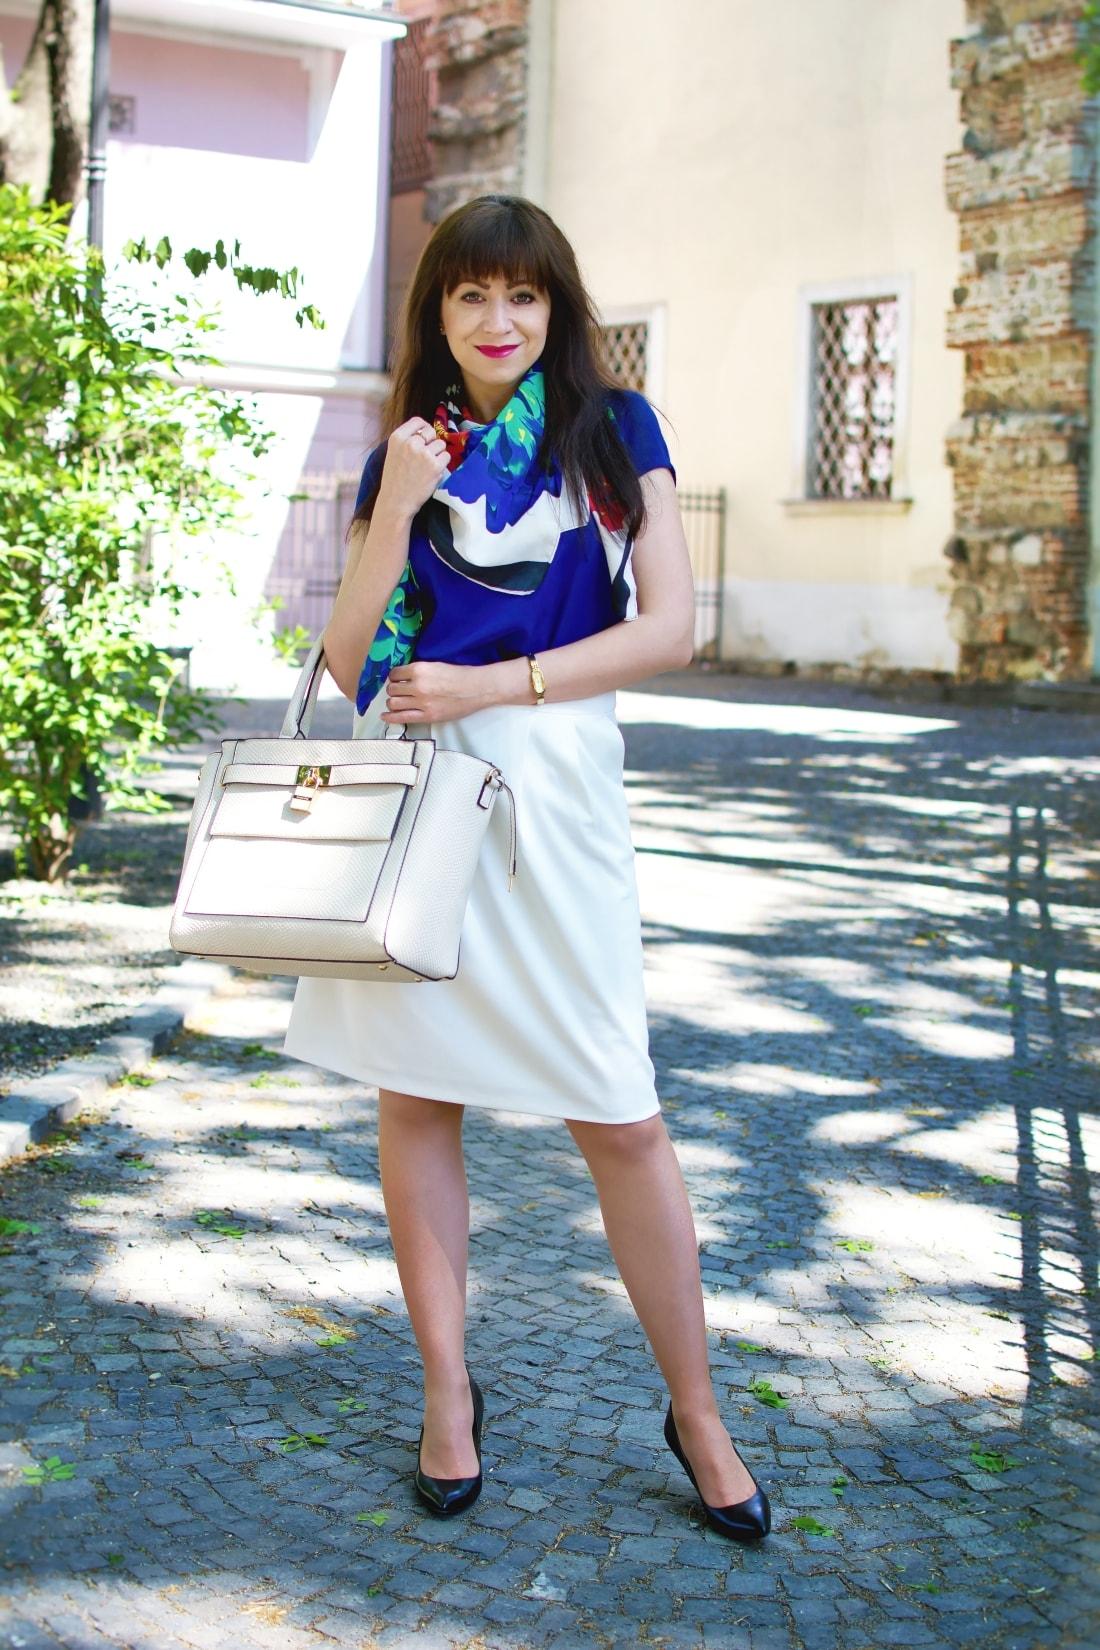 katharine-fashion-is-beautiful-blog-mix-kvetov-a-satka-1-blogger